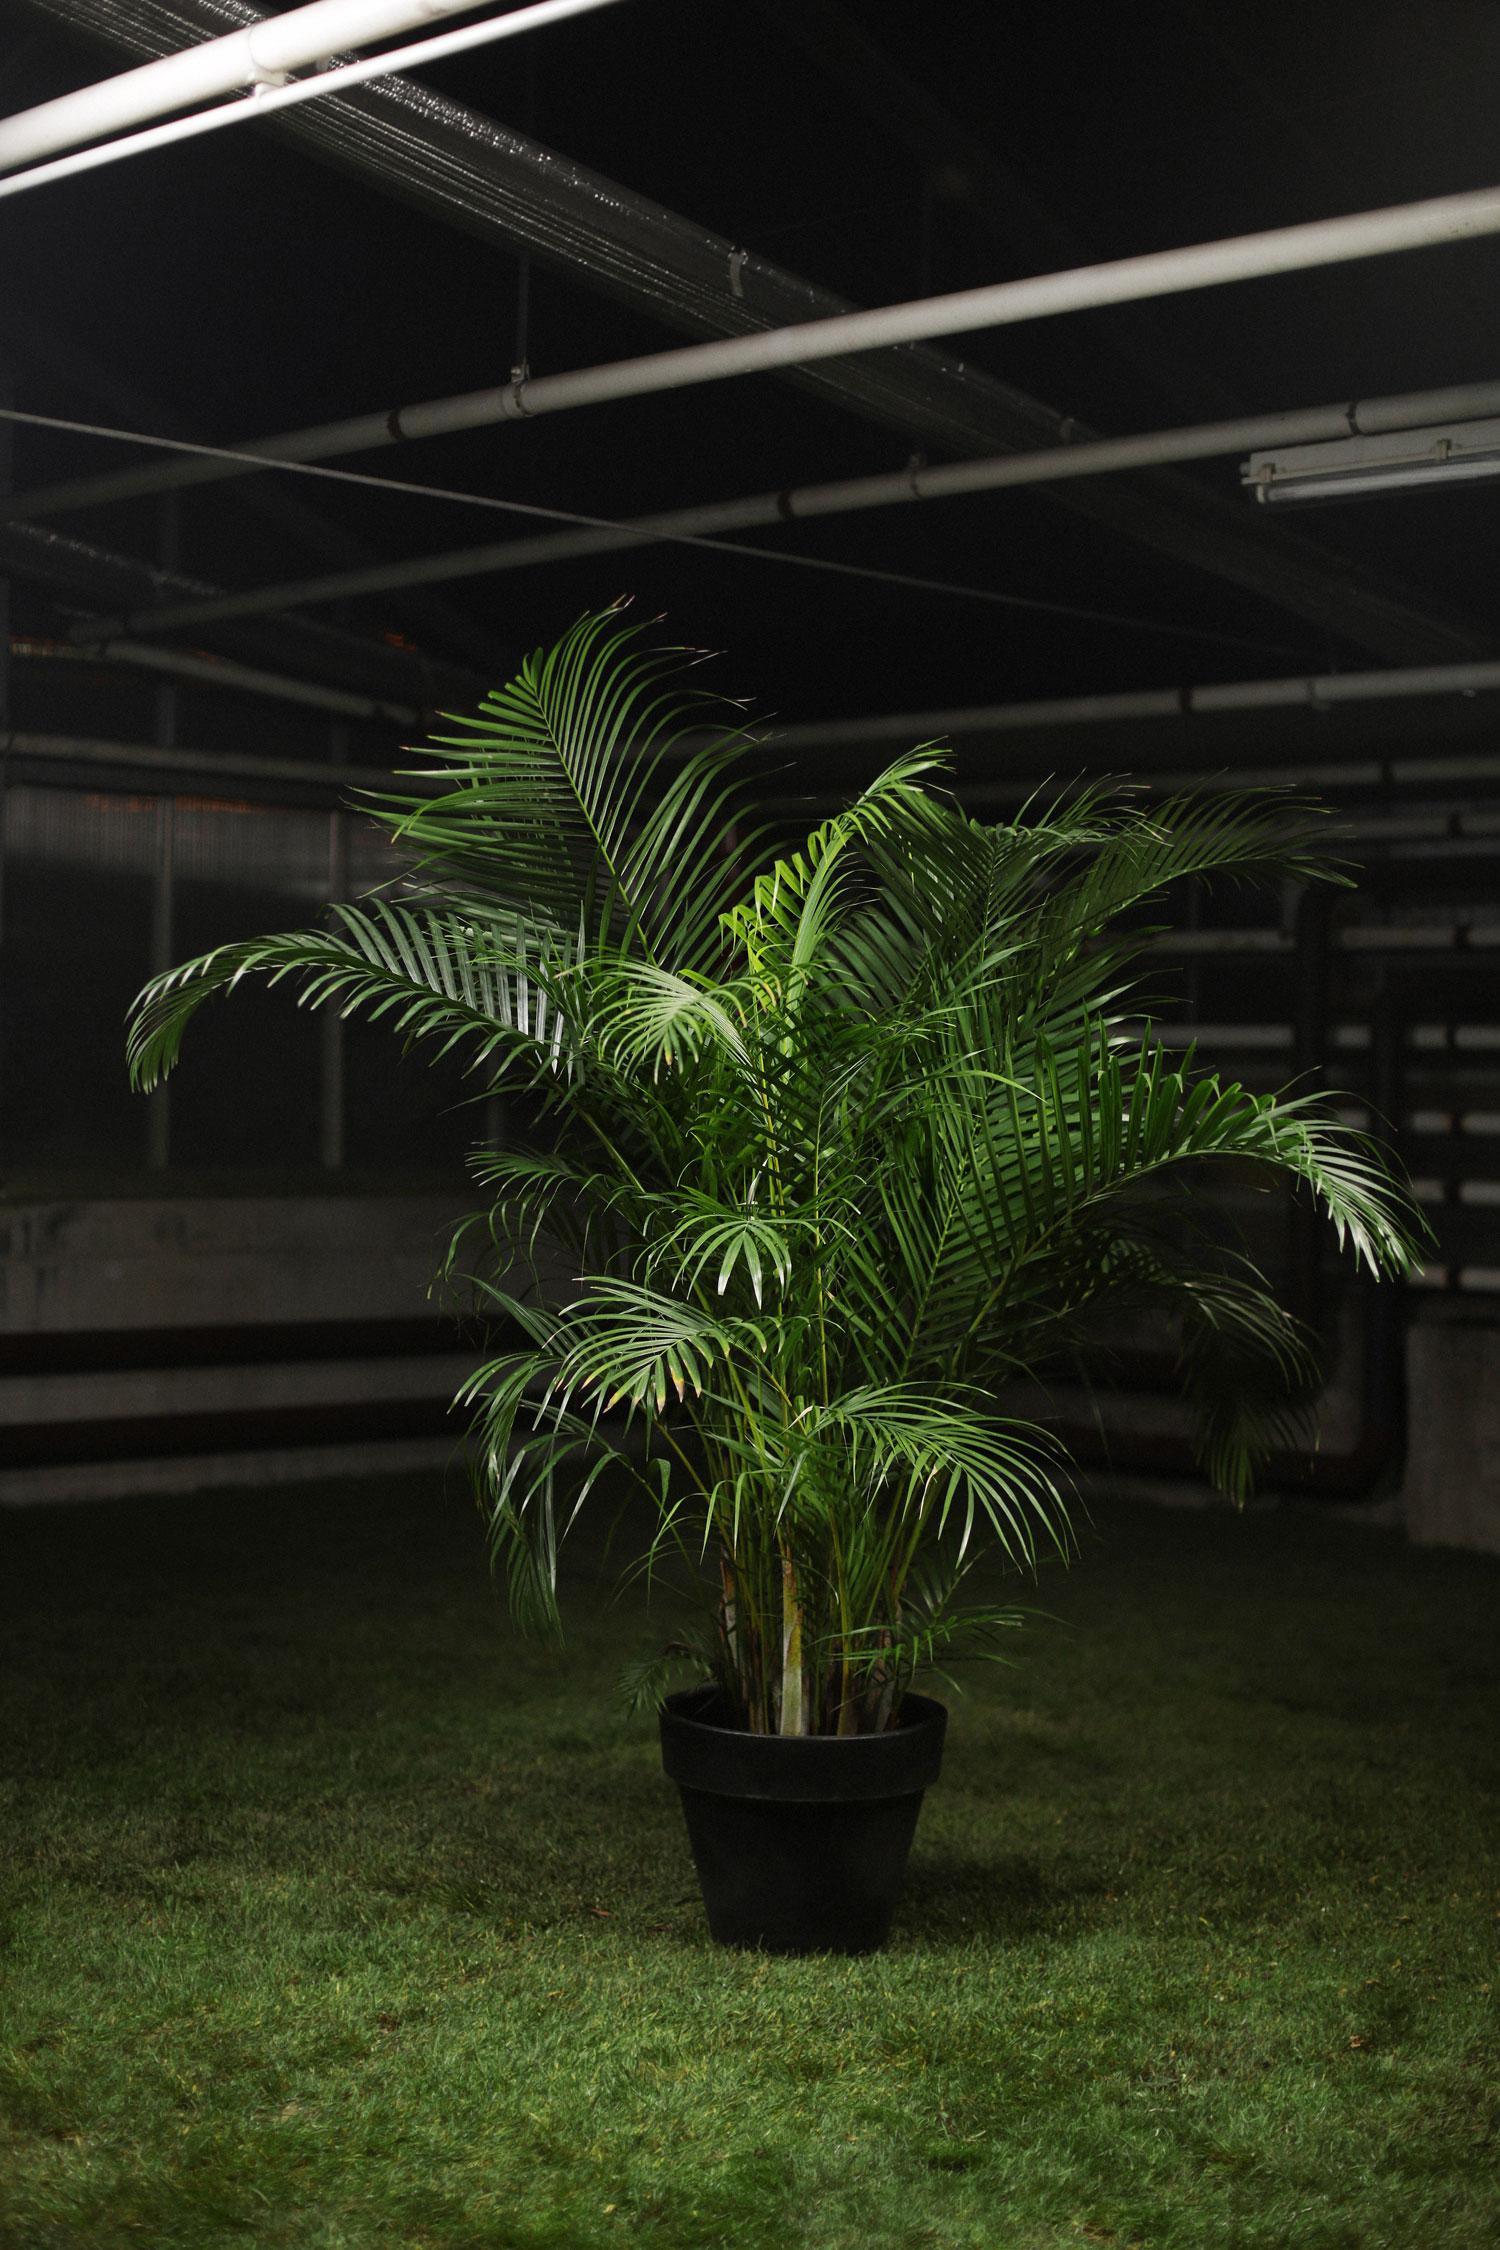 location de plantes strasbourg colmar mulhouse b le. Black Bedroom Furniture Sets. Home Design Ideas